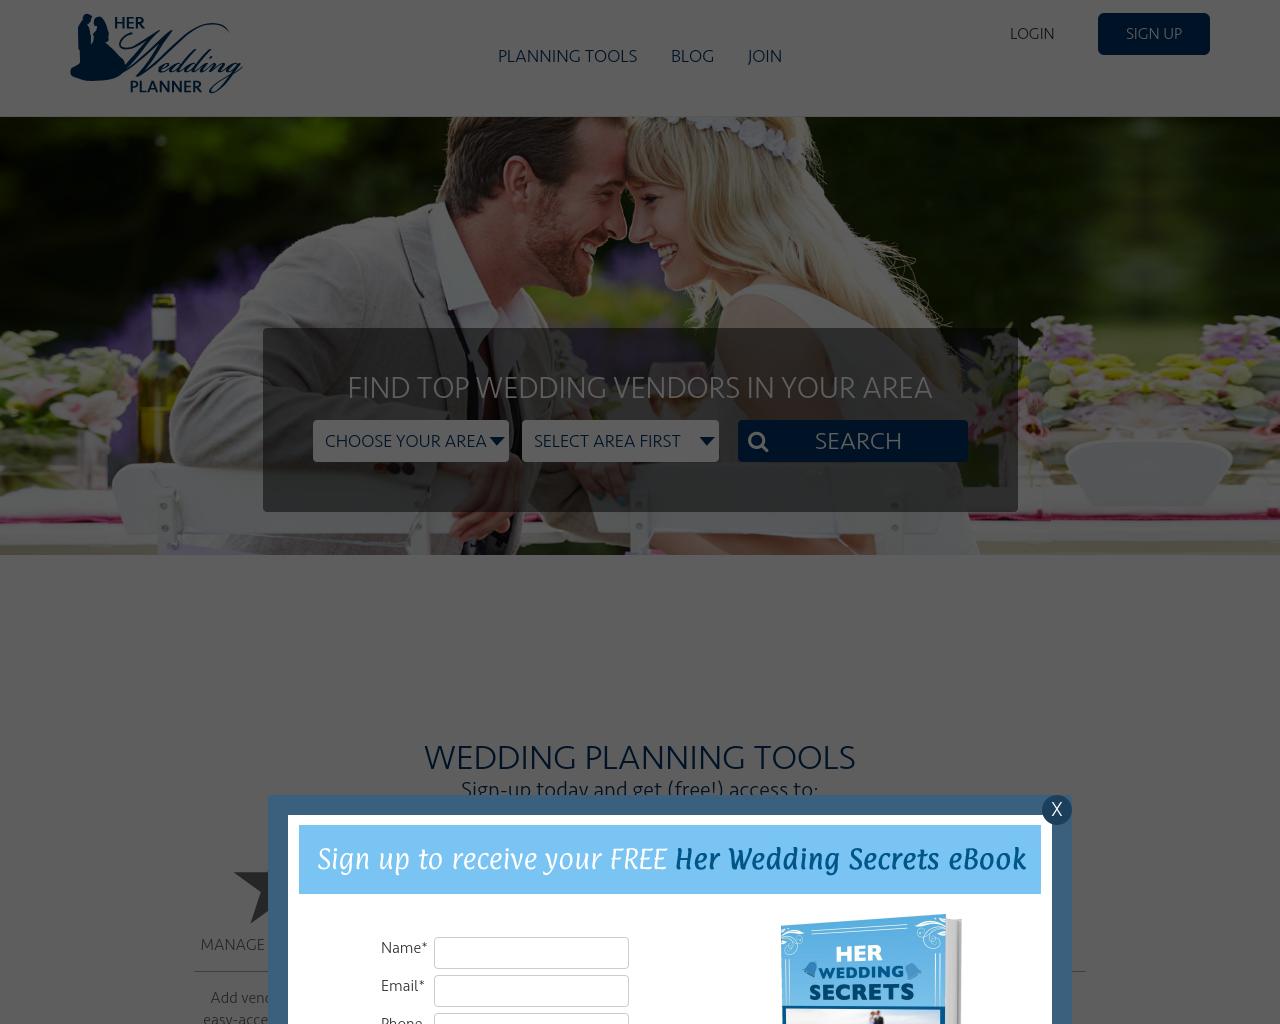 Orlando-Wedding-Planner.com-Advertising-Reviews-Pricing